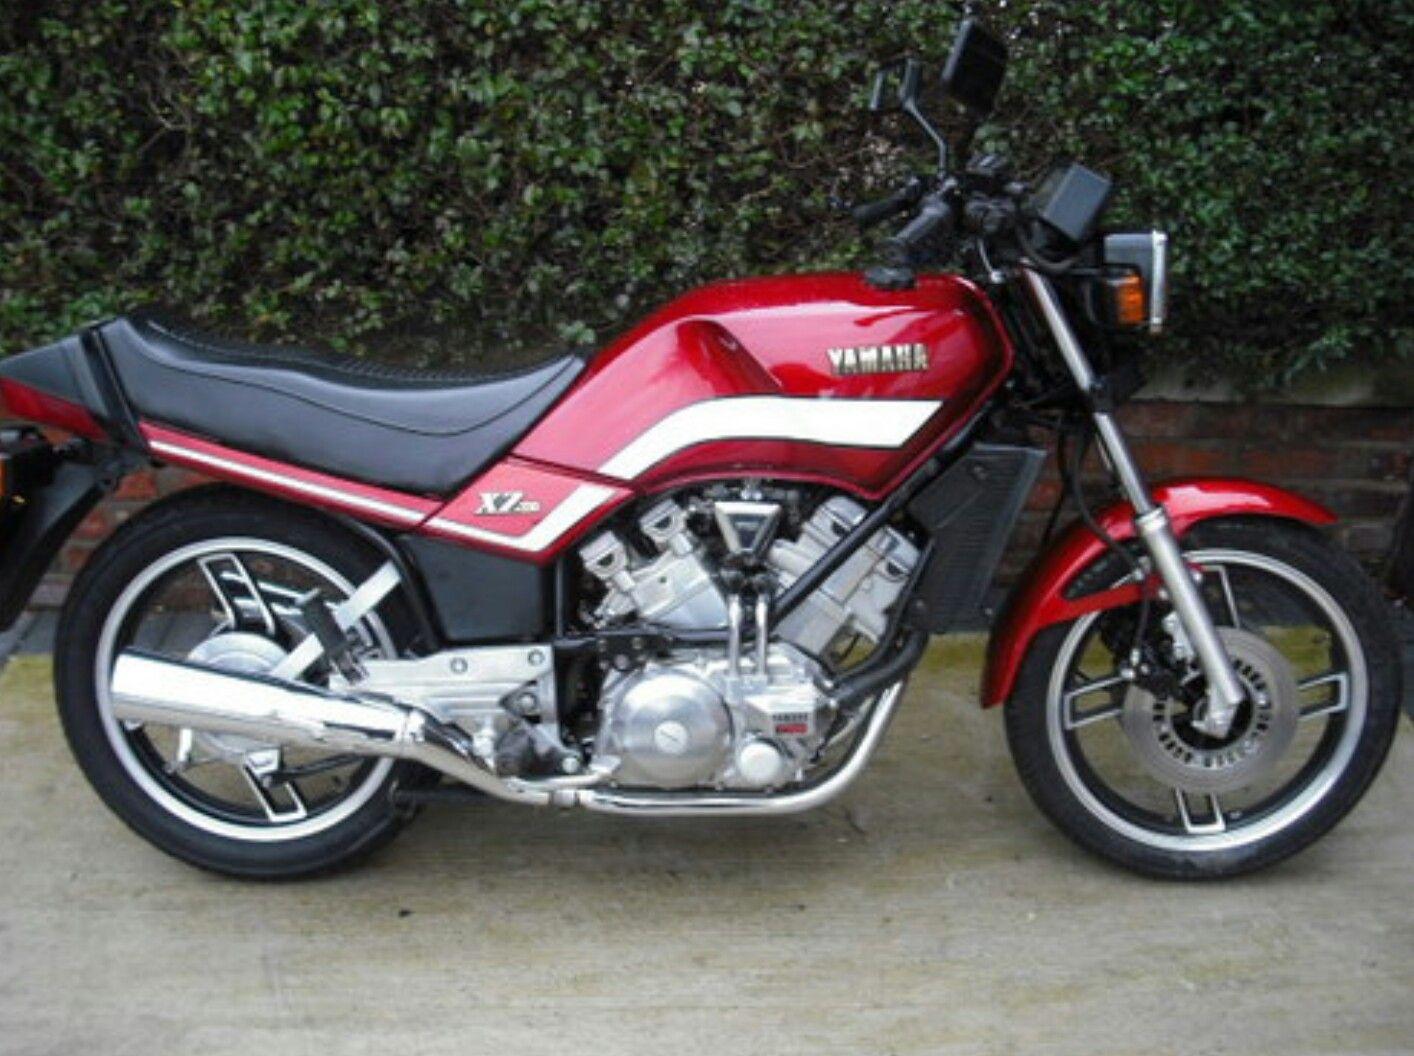 Yamaha XZ 550   2-Wheeler World   Pinterest   Yamaha motor